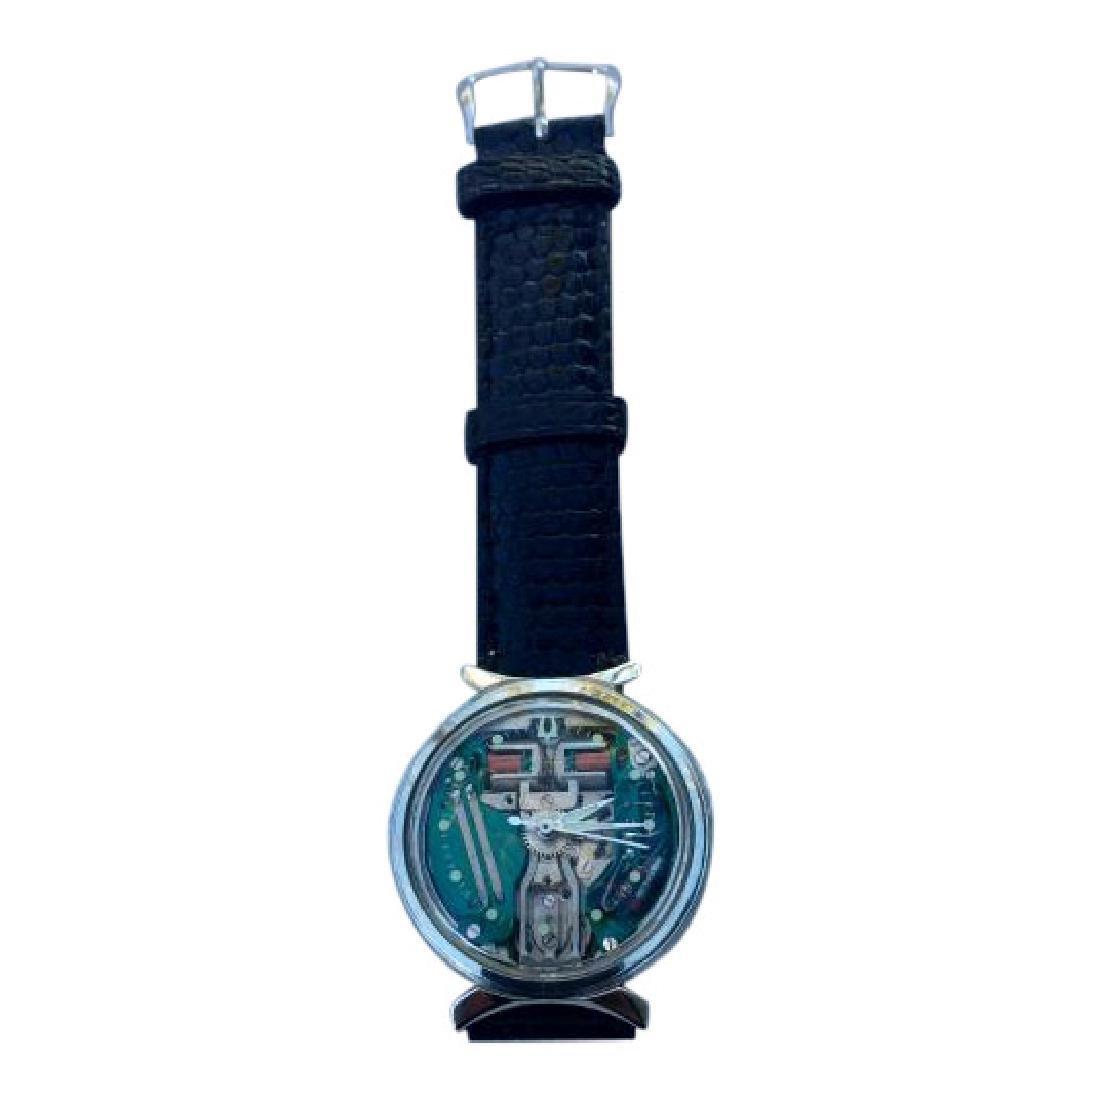 Vintage Bulova Accutron Spaceview Bowtie Watch, 1967